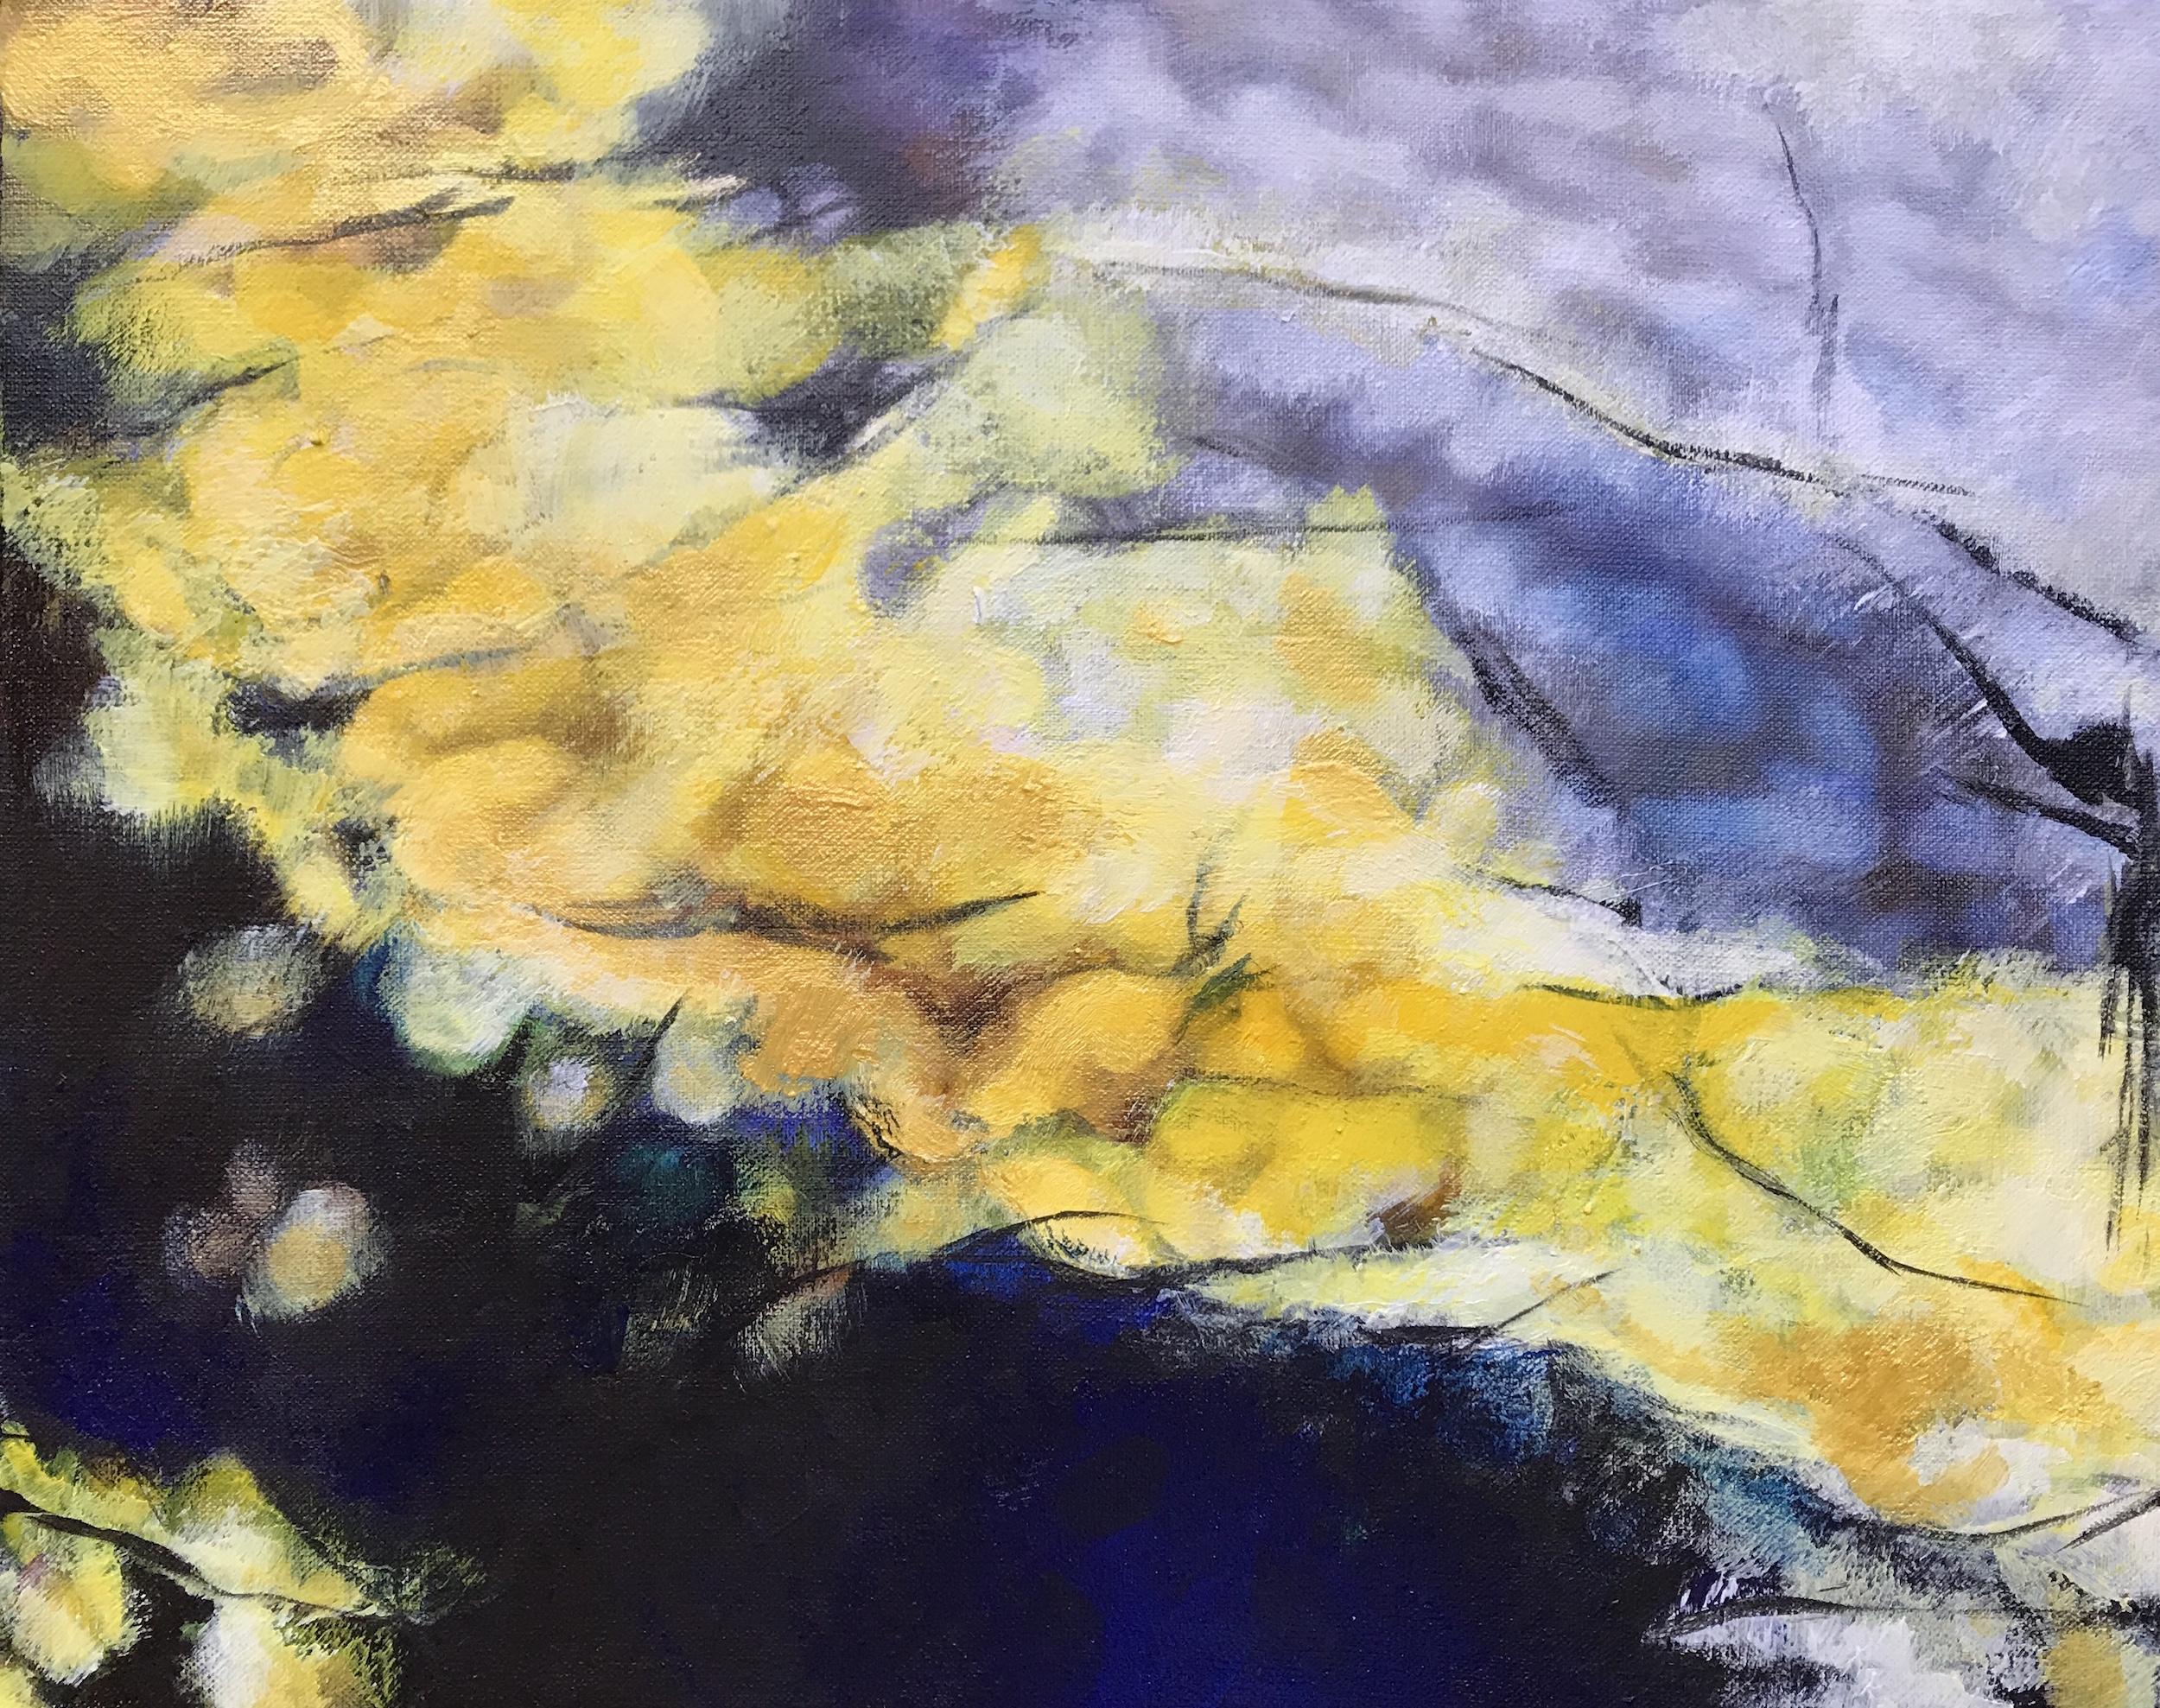 First Breath - acrylic on canvas  30x24cm £90